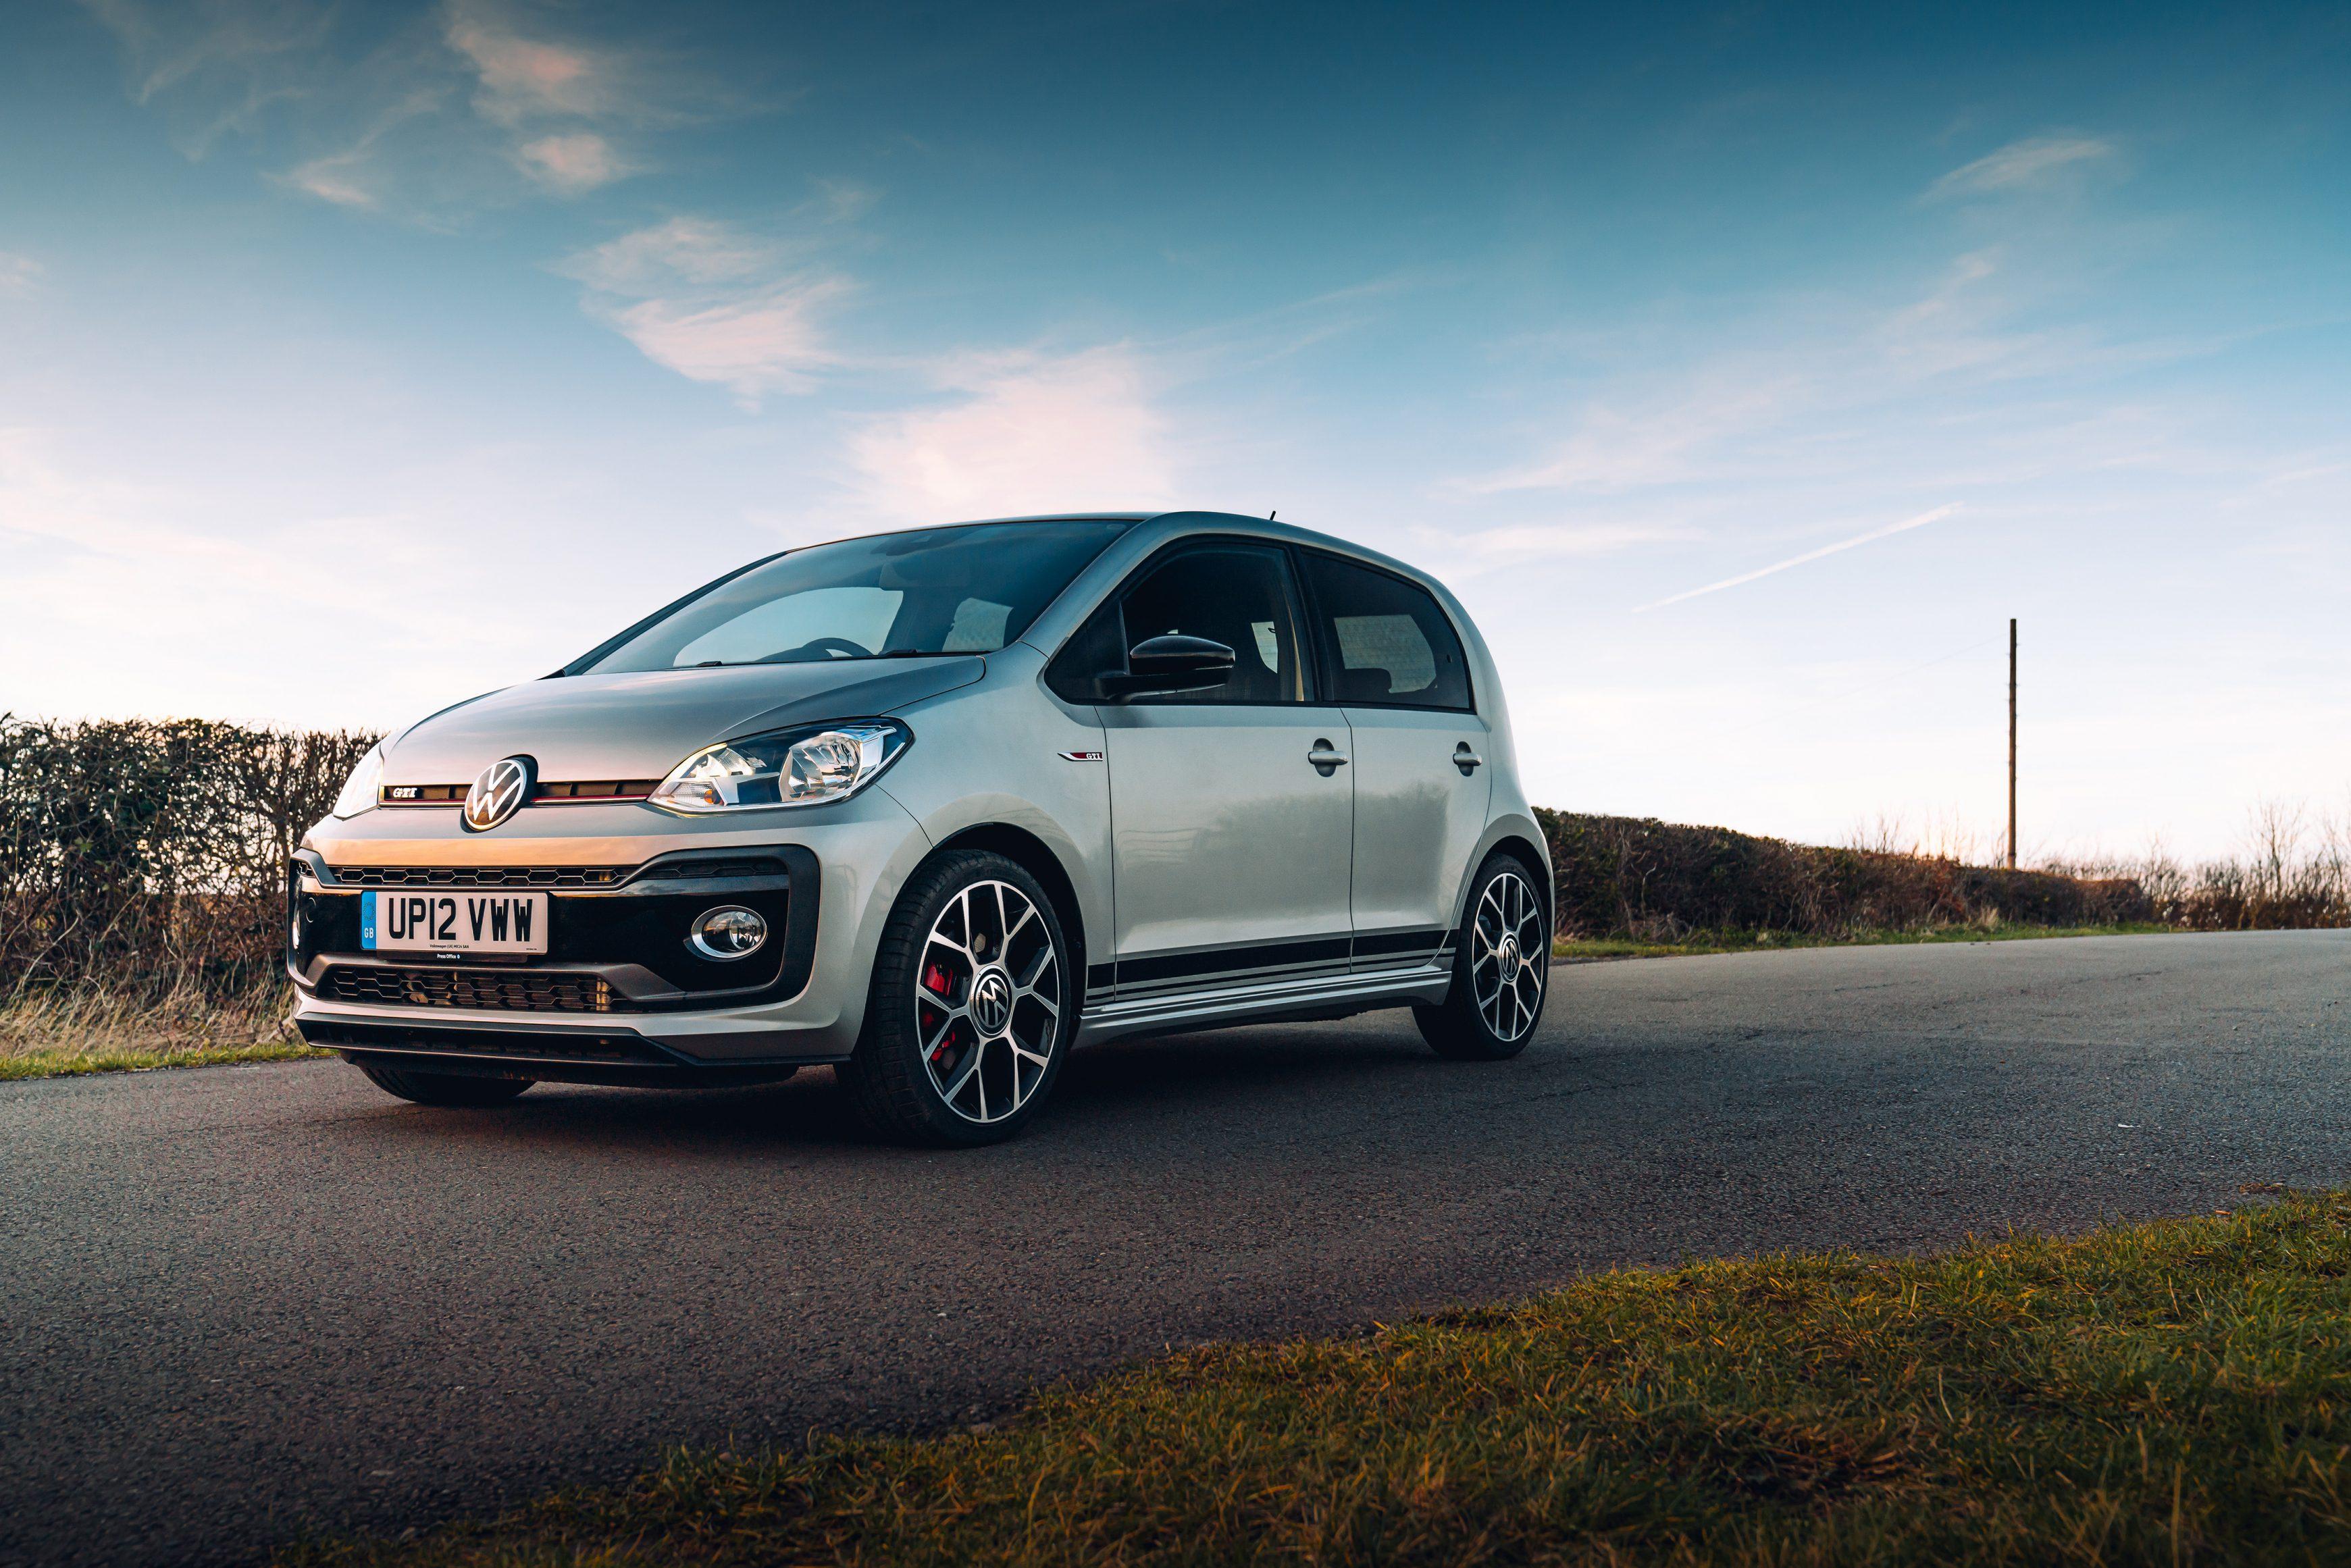 The best city cars UK - Volkswagen up! GTI